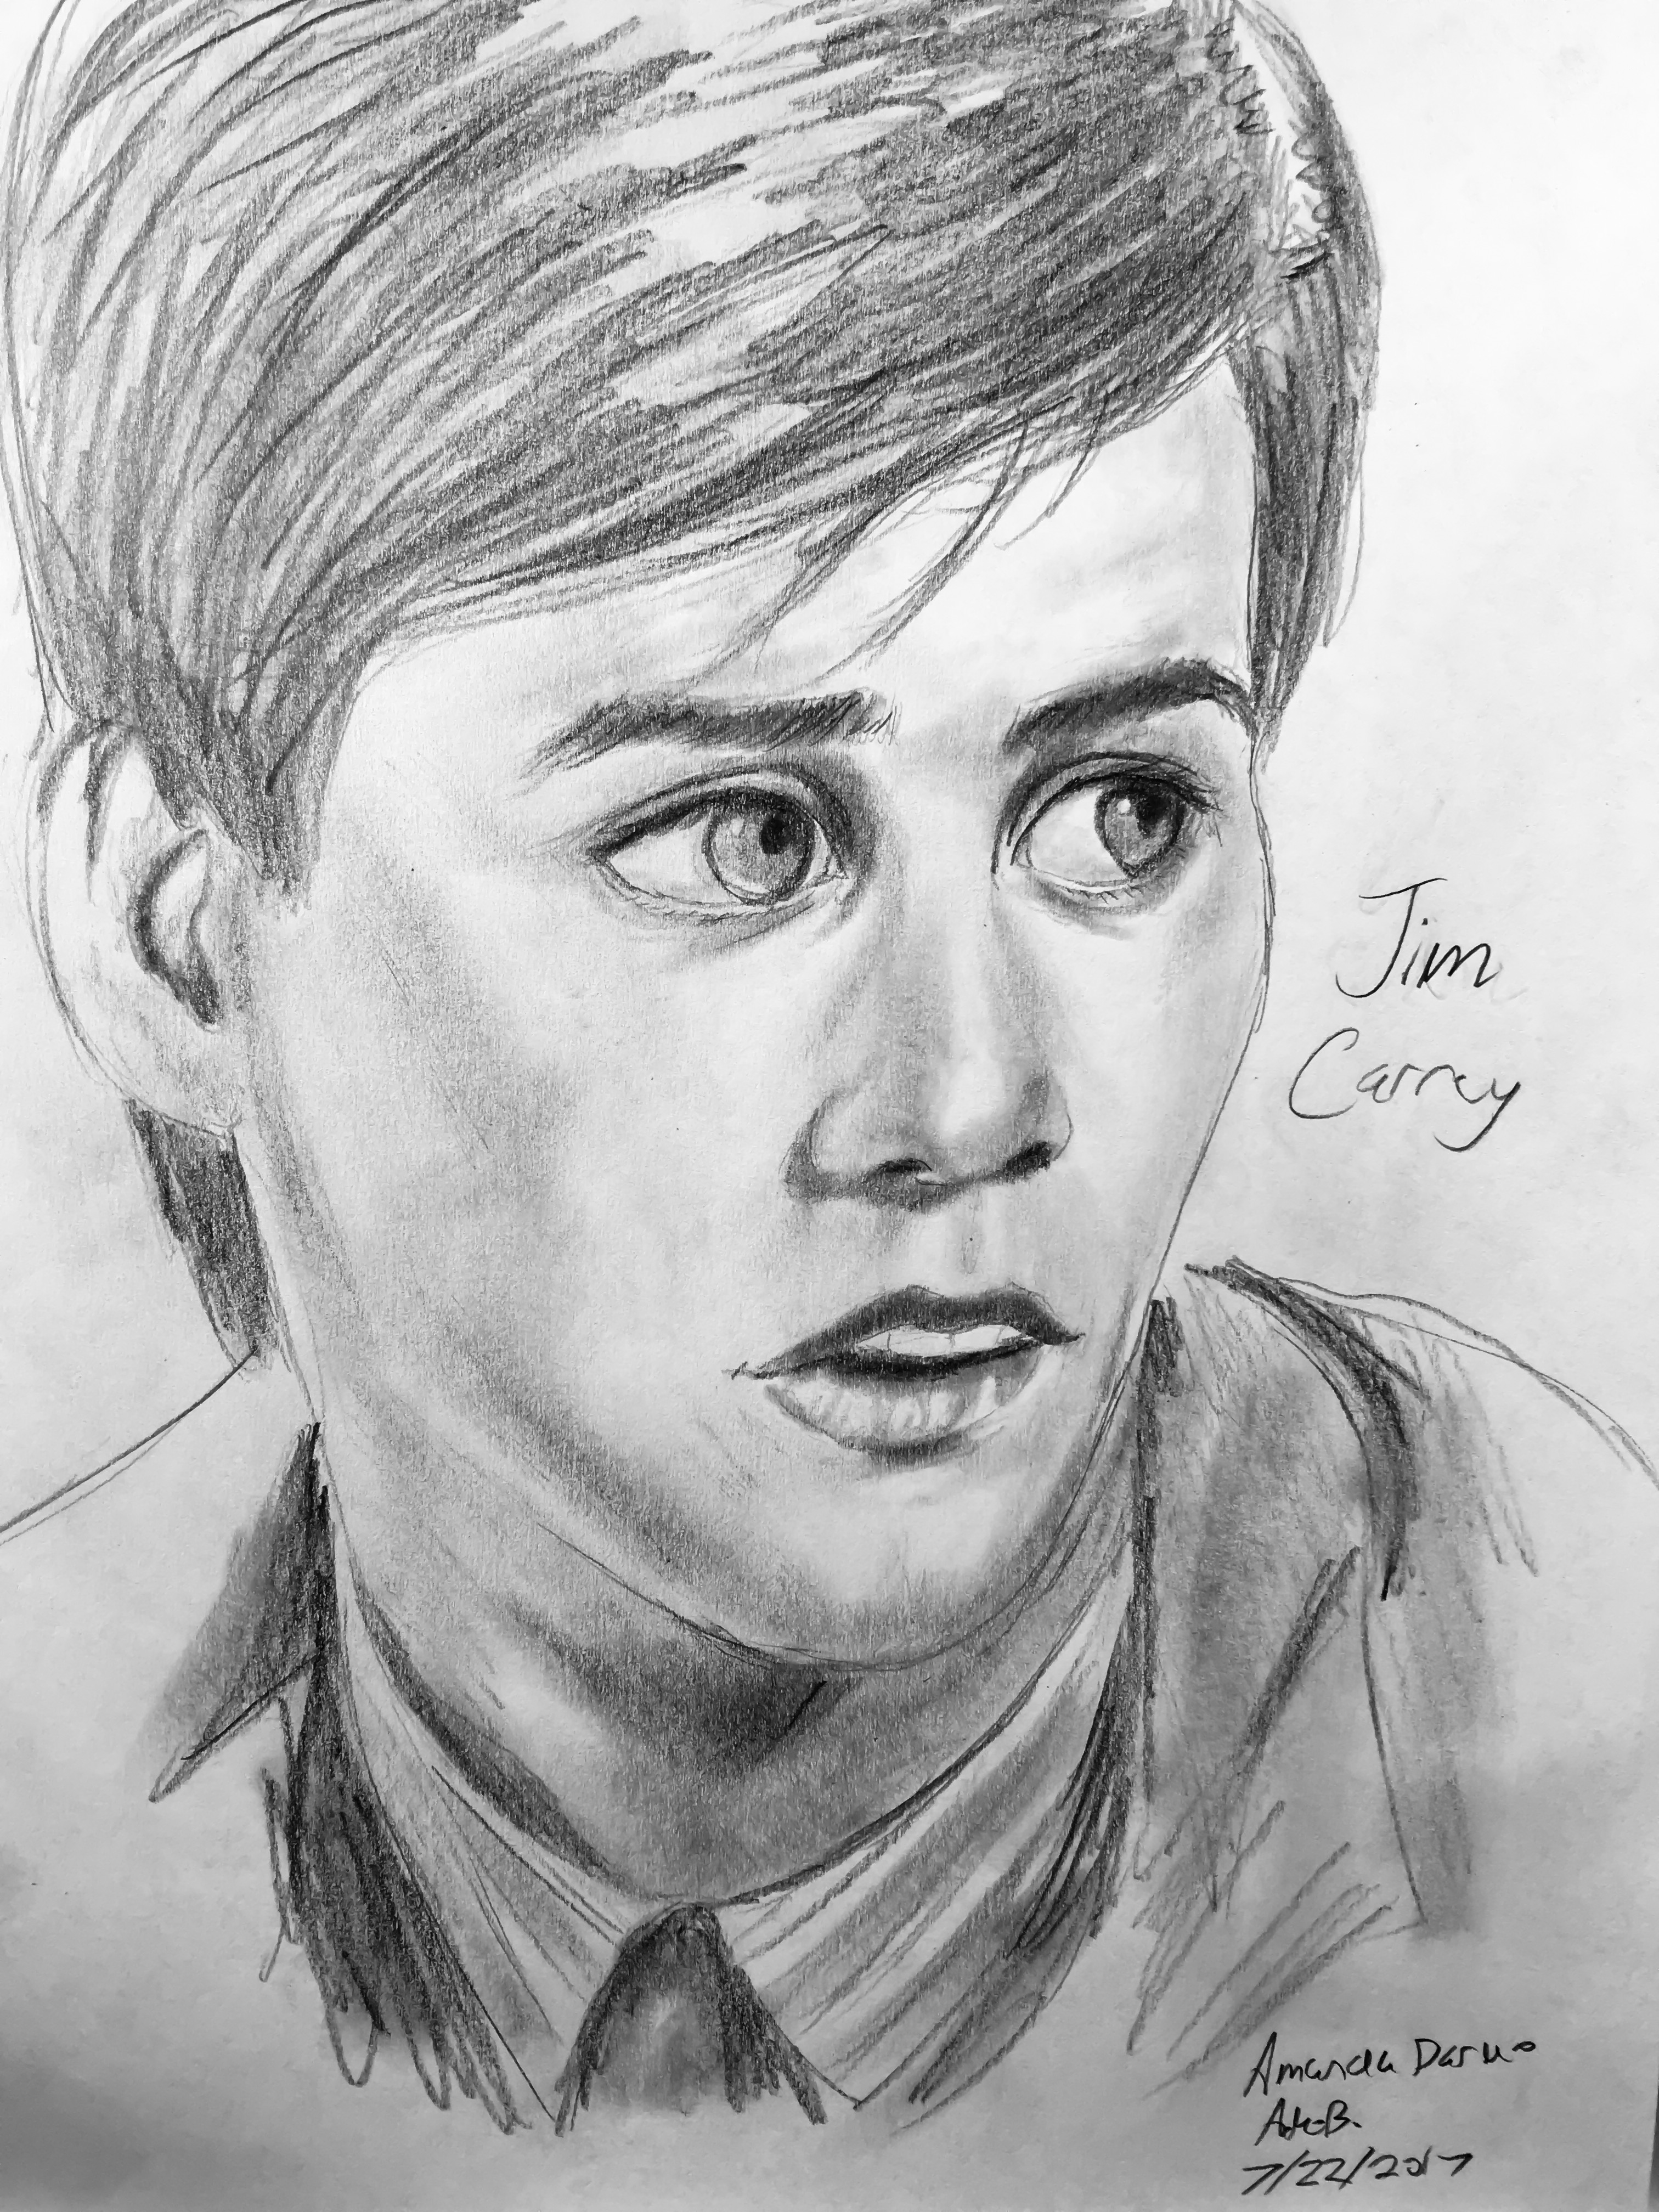 Classic Jim carrey